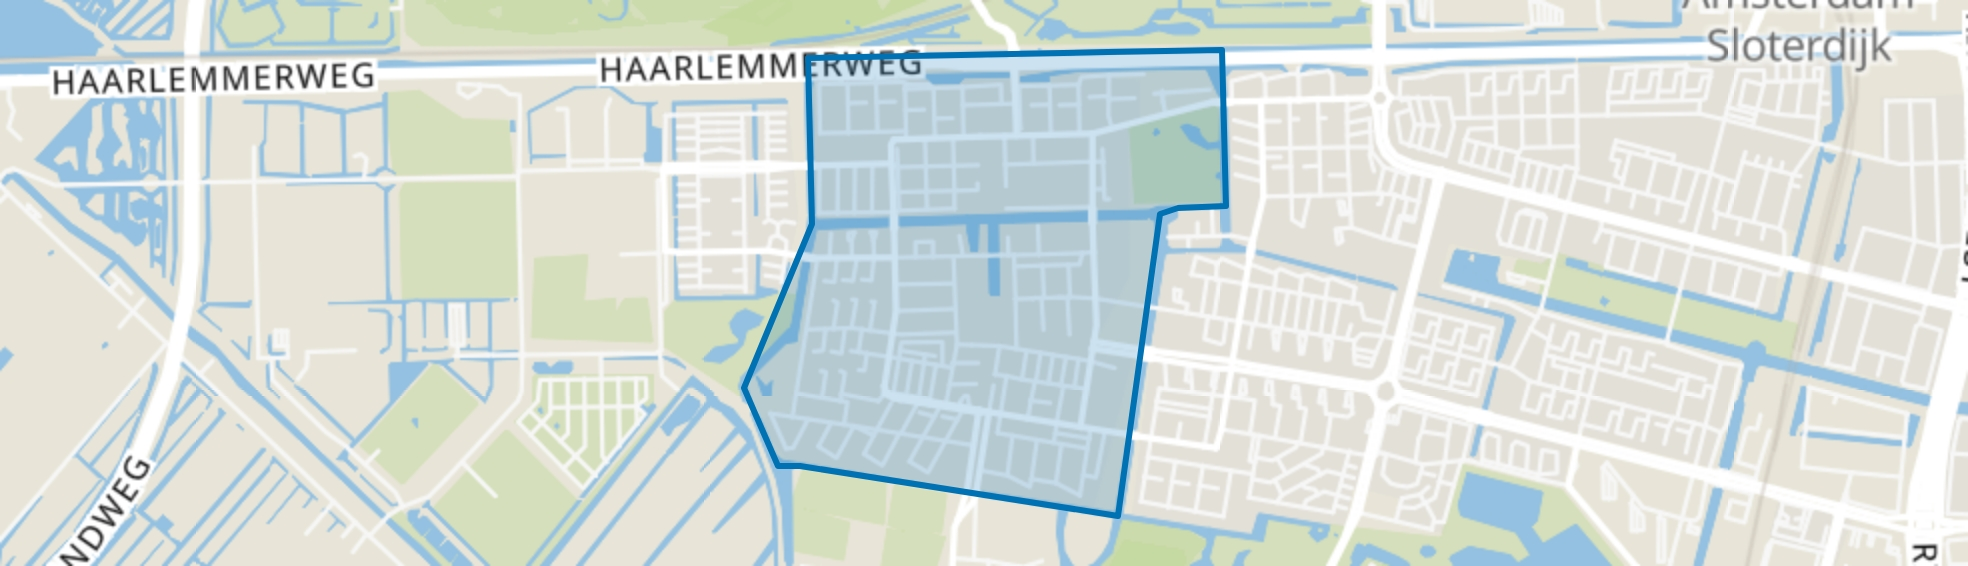 Geuzenveld, Amsterdam map